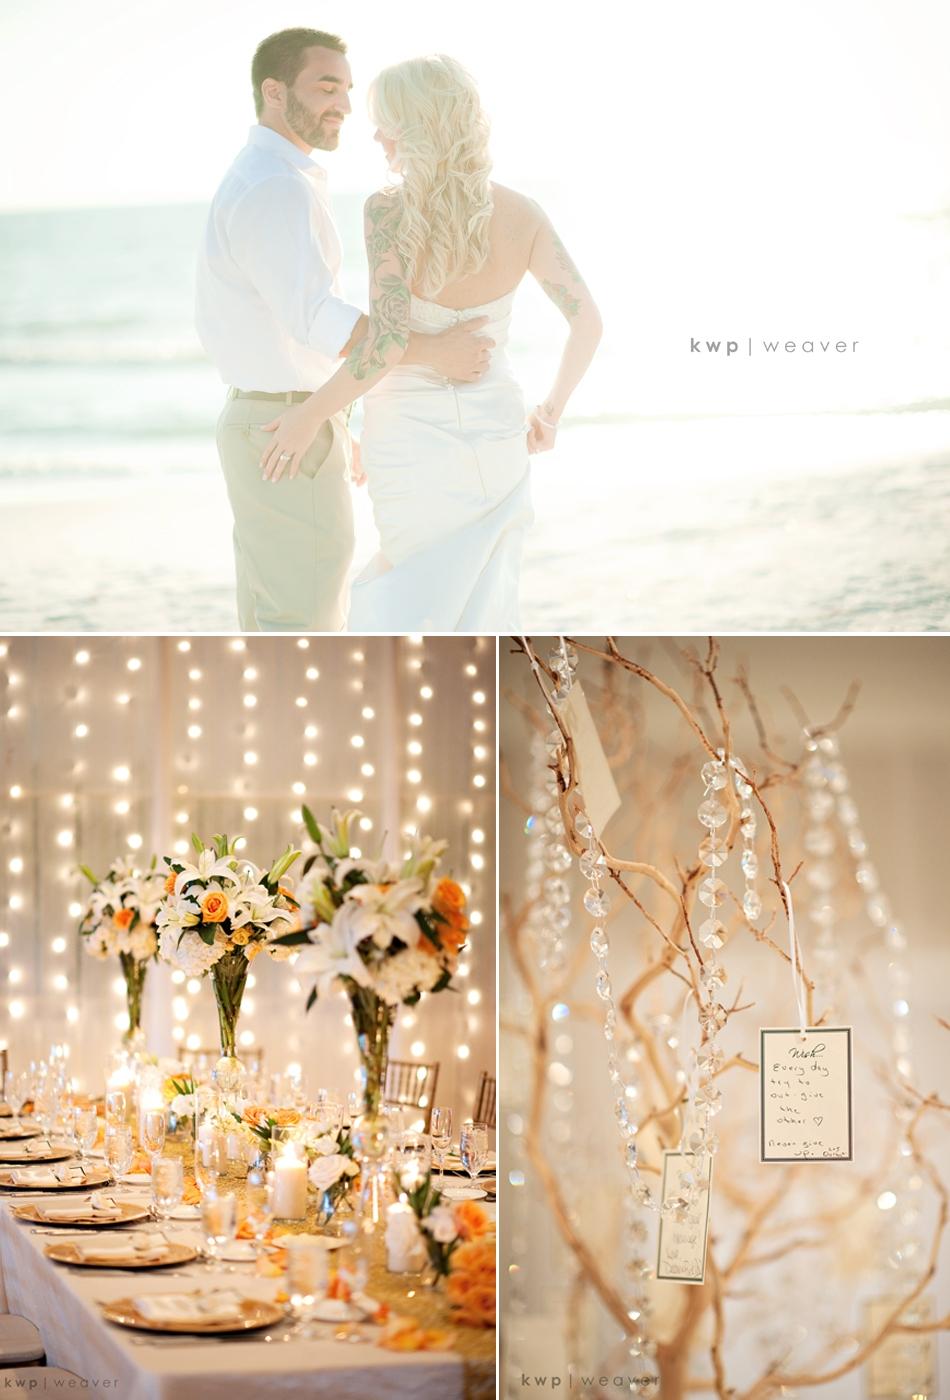 10 Stylish Beach Theme Wedding Reception Ideas unique beach wedding reception ideas all about wedding ideas 2020